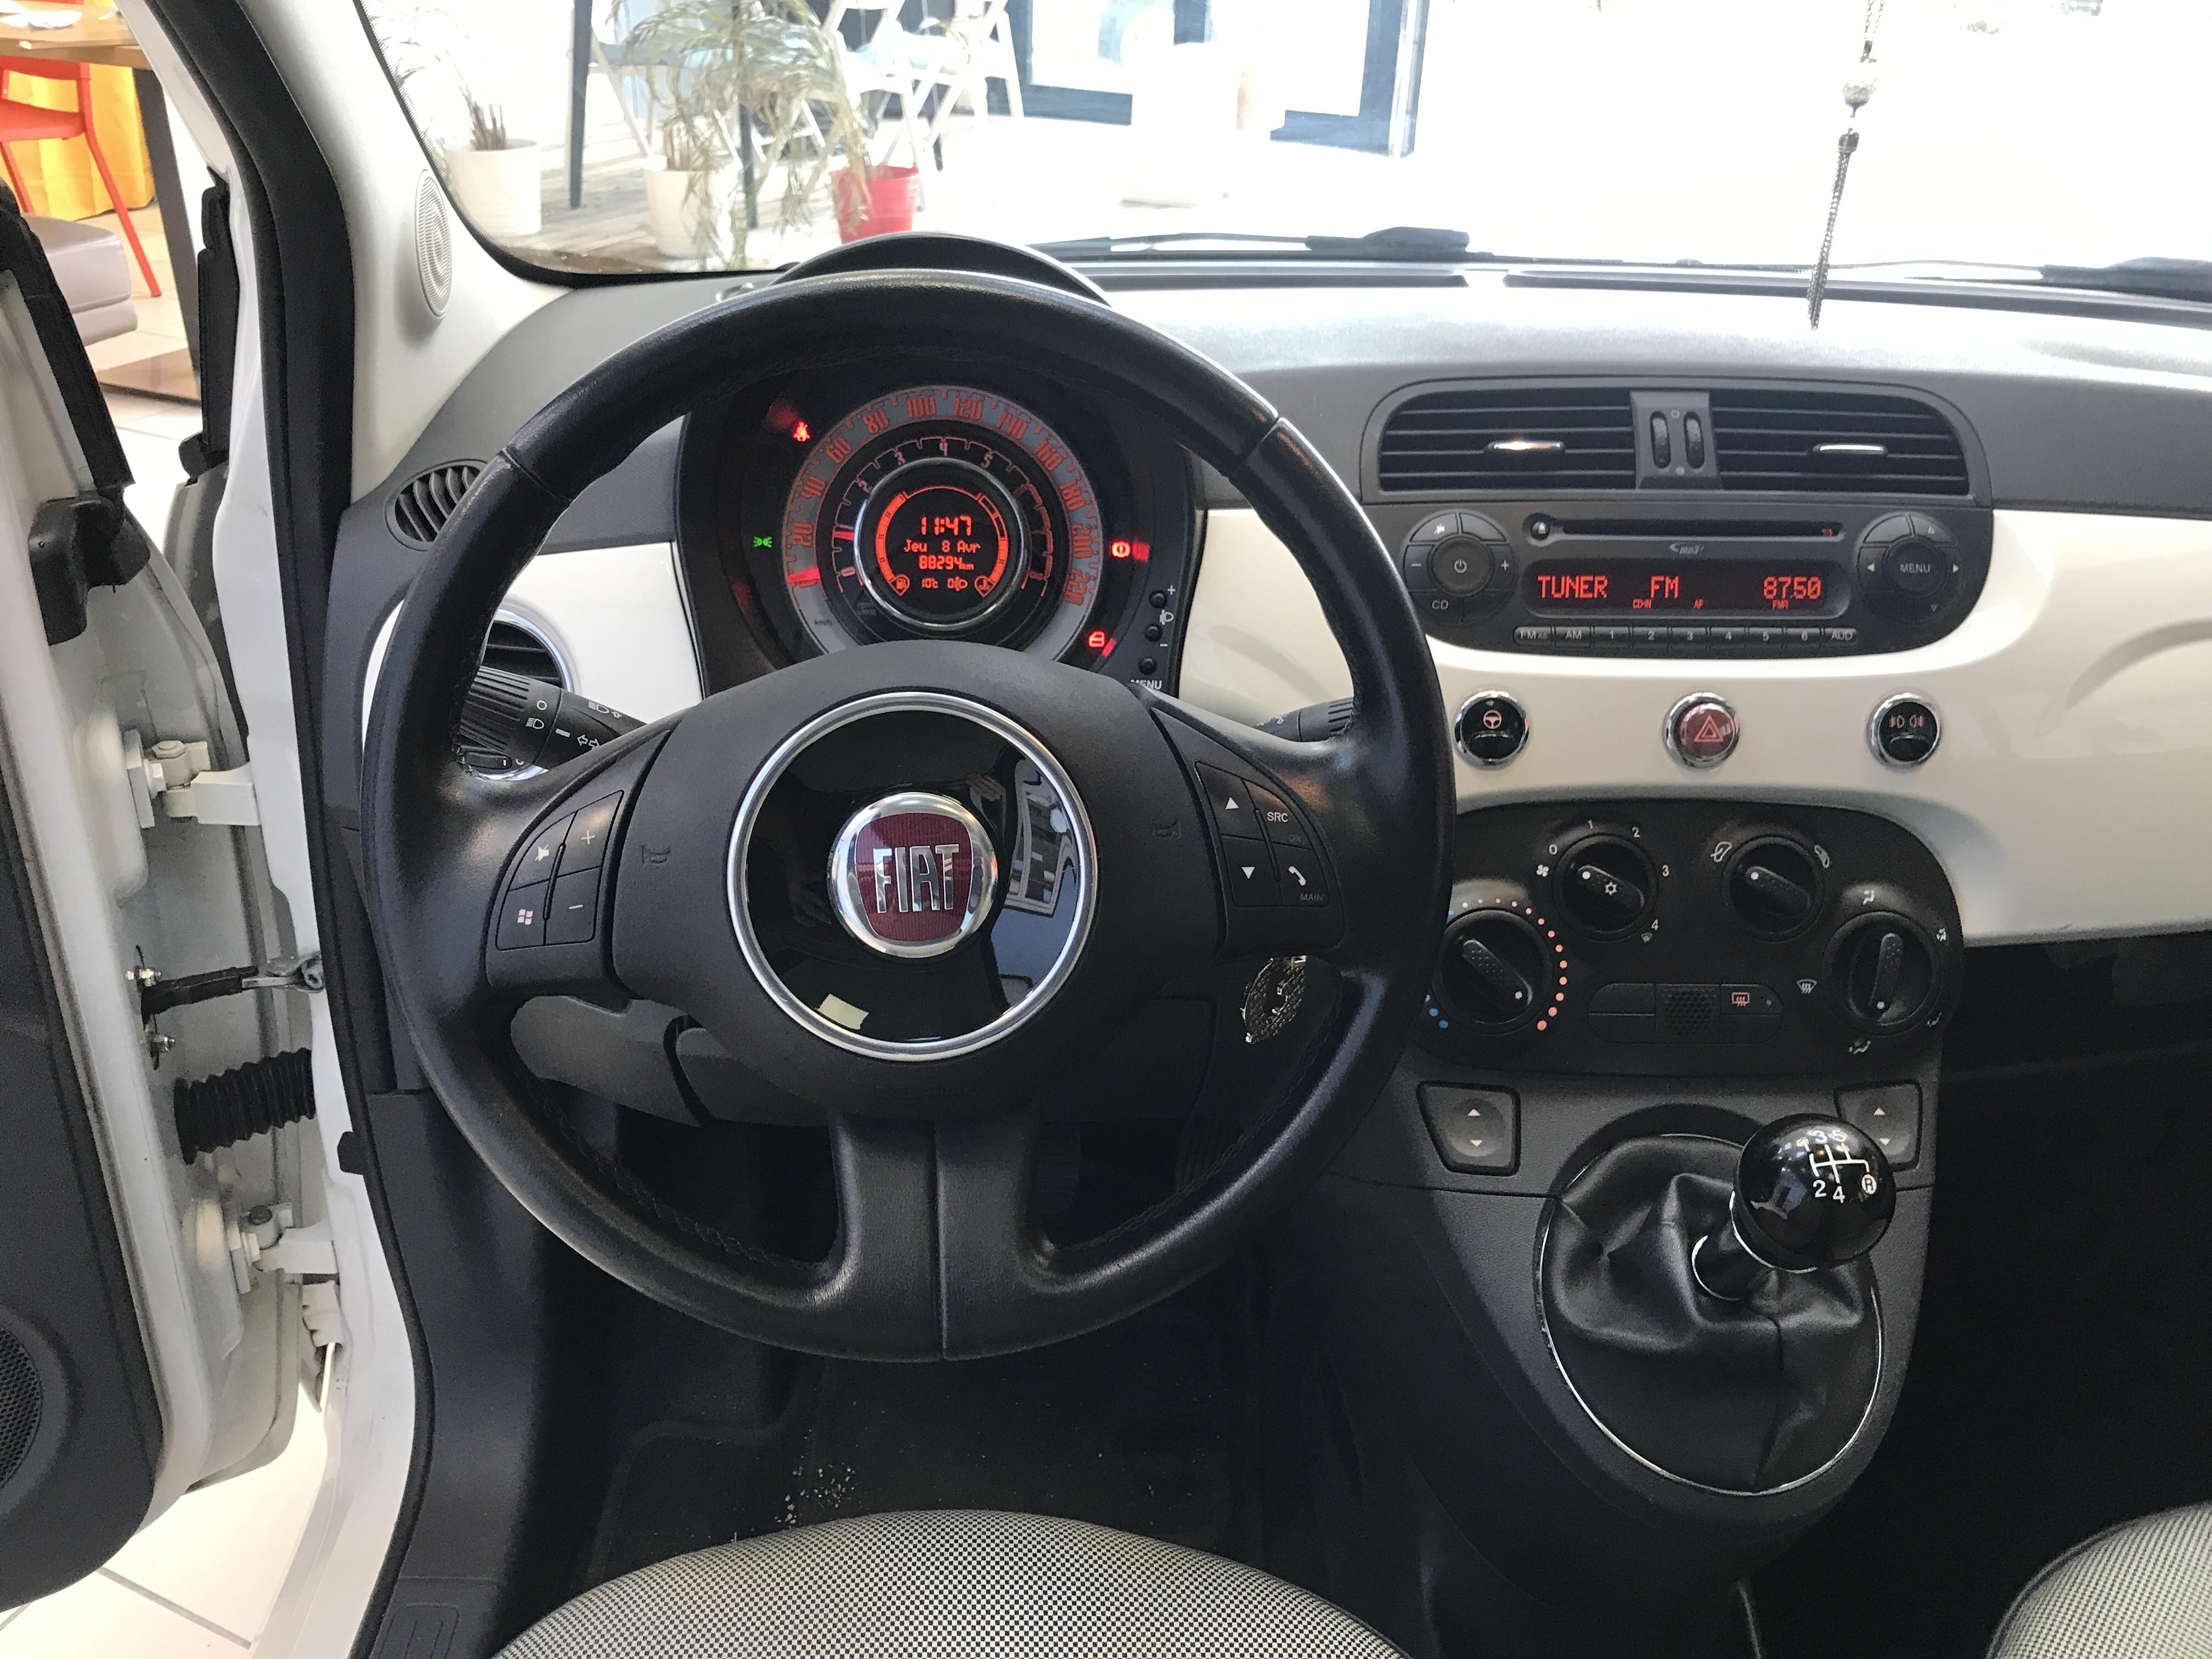 photo_Fiat 500 LOUNGE 1.2 MPi 69cv, Carslift